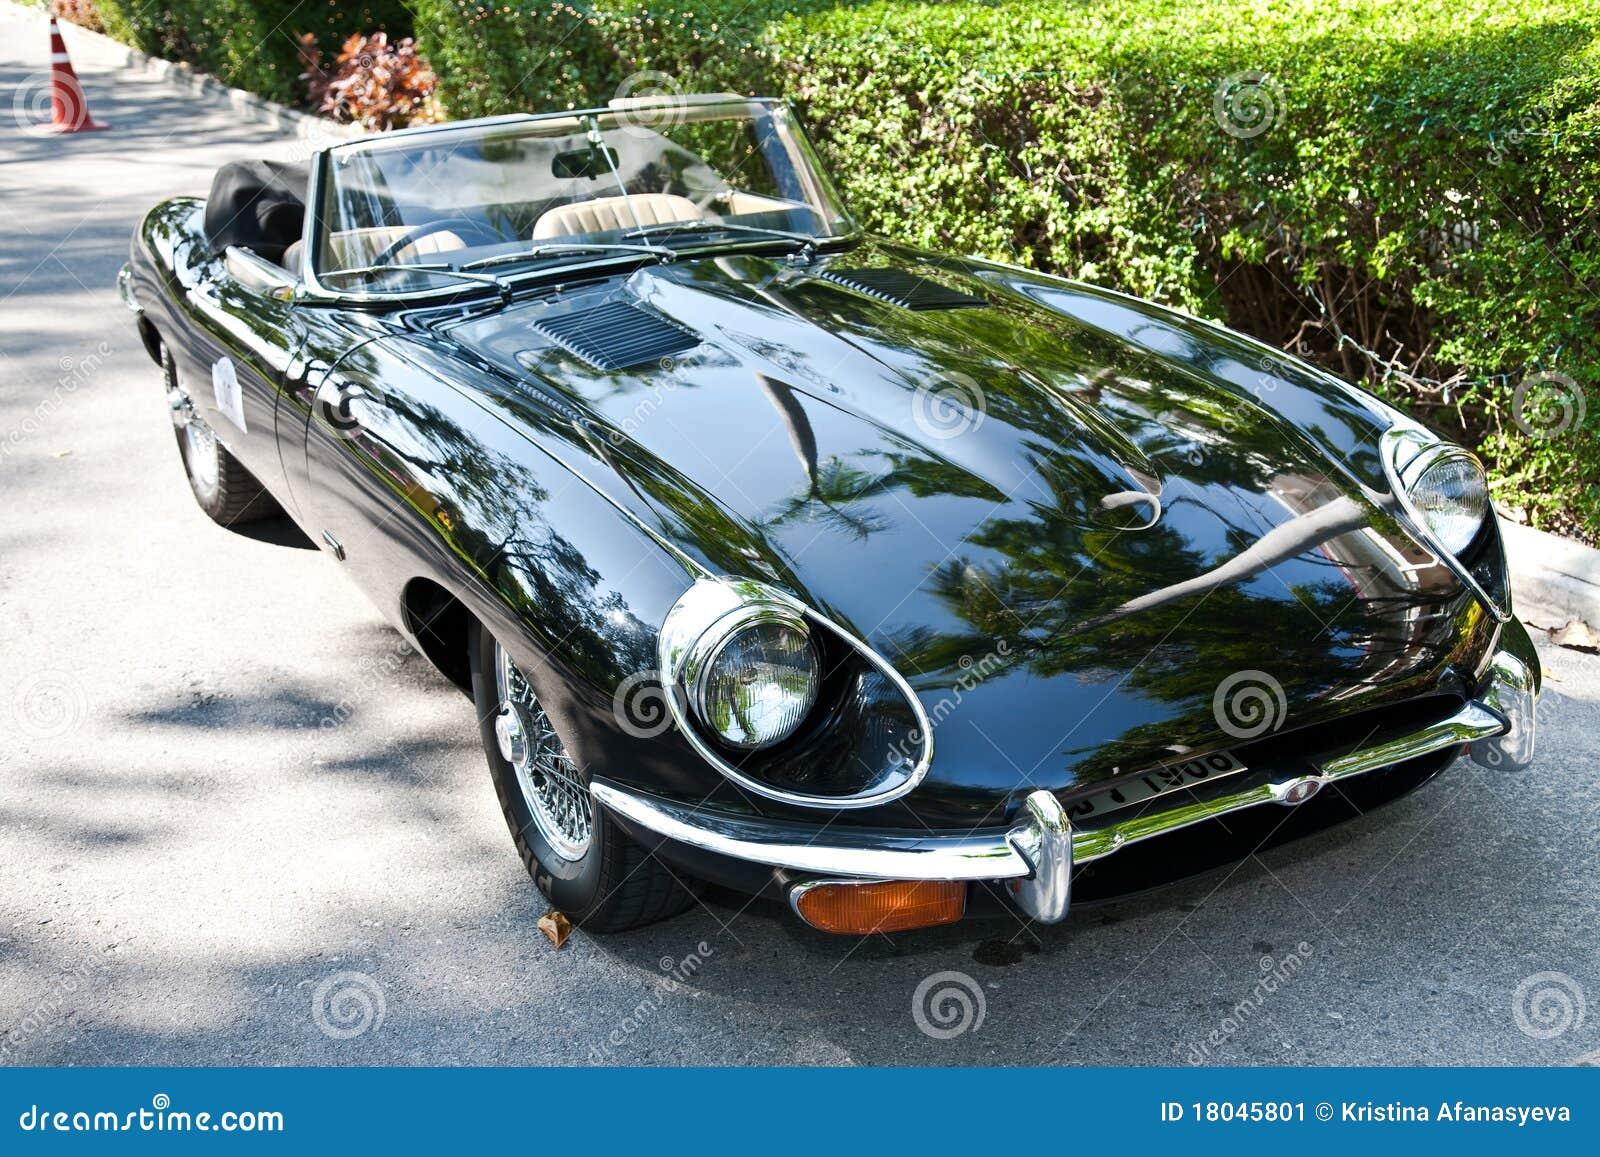 Jaguar E Type On Vintage Car Parade Stock Image